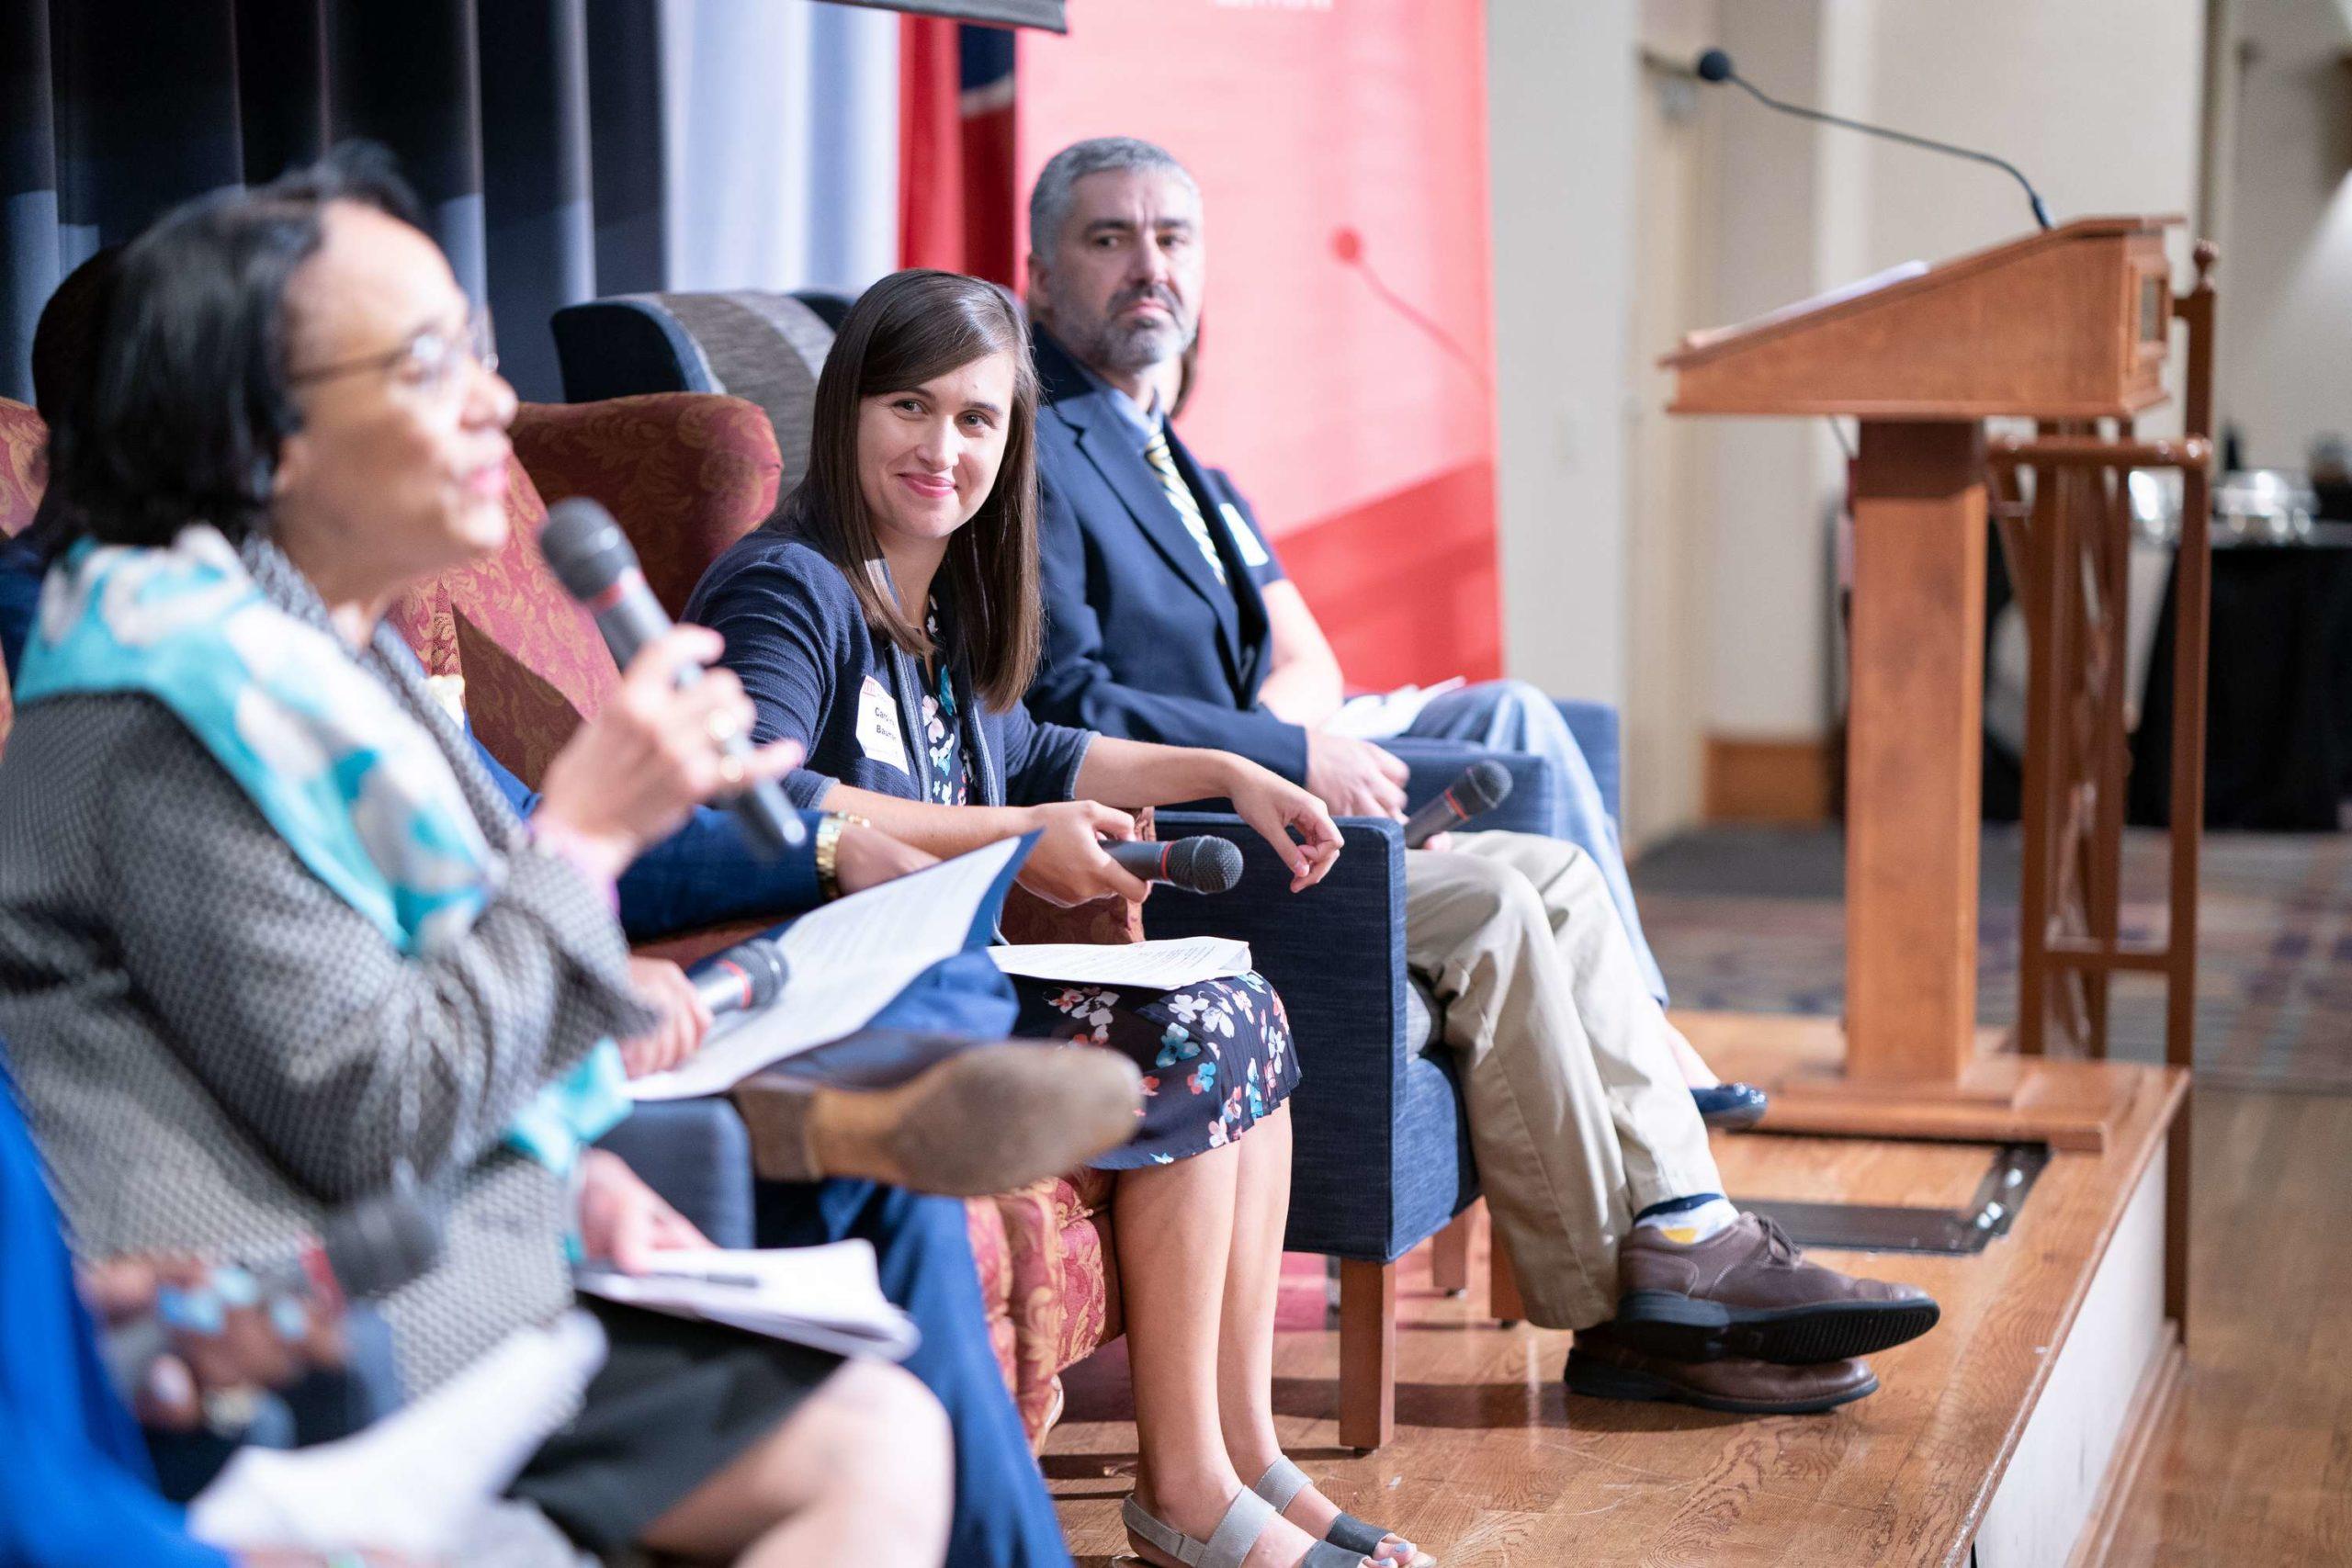 Caroline Bauman (center) moderates a panel in 2019 on teacher diversity and talent.